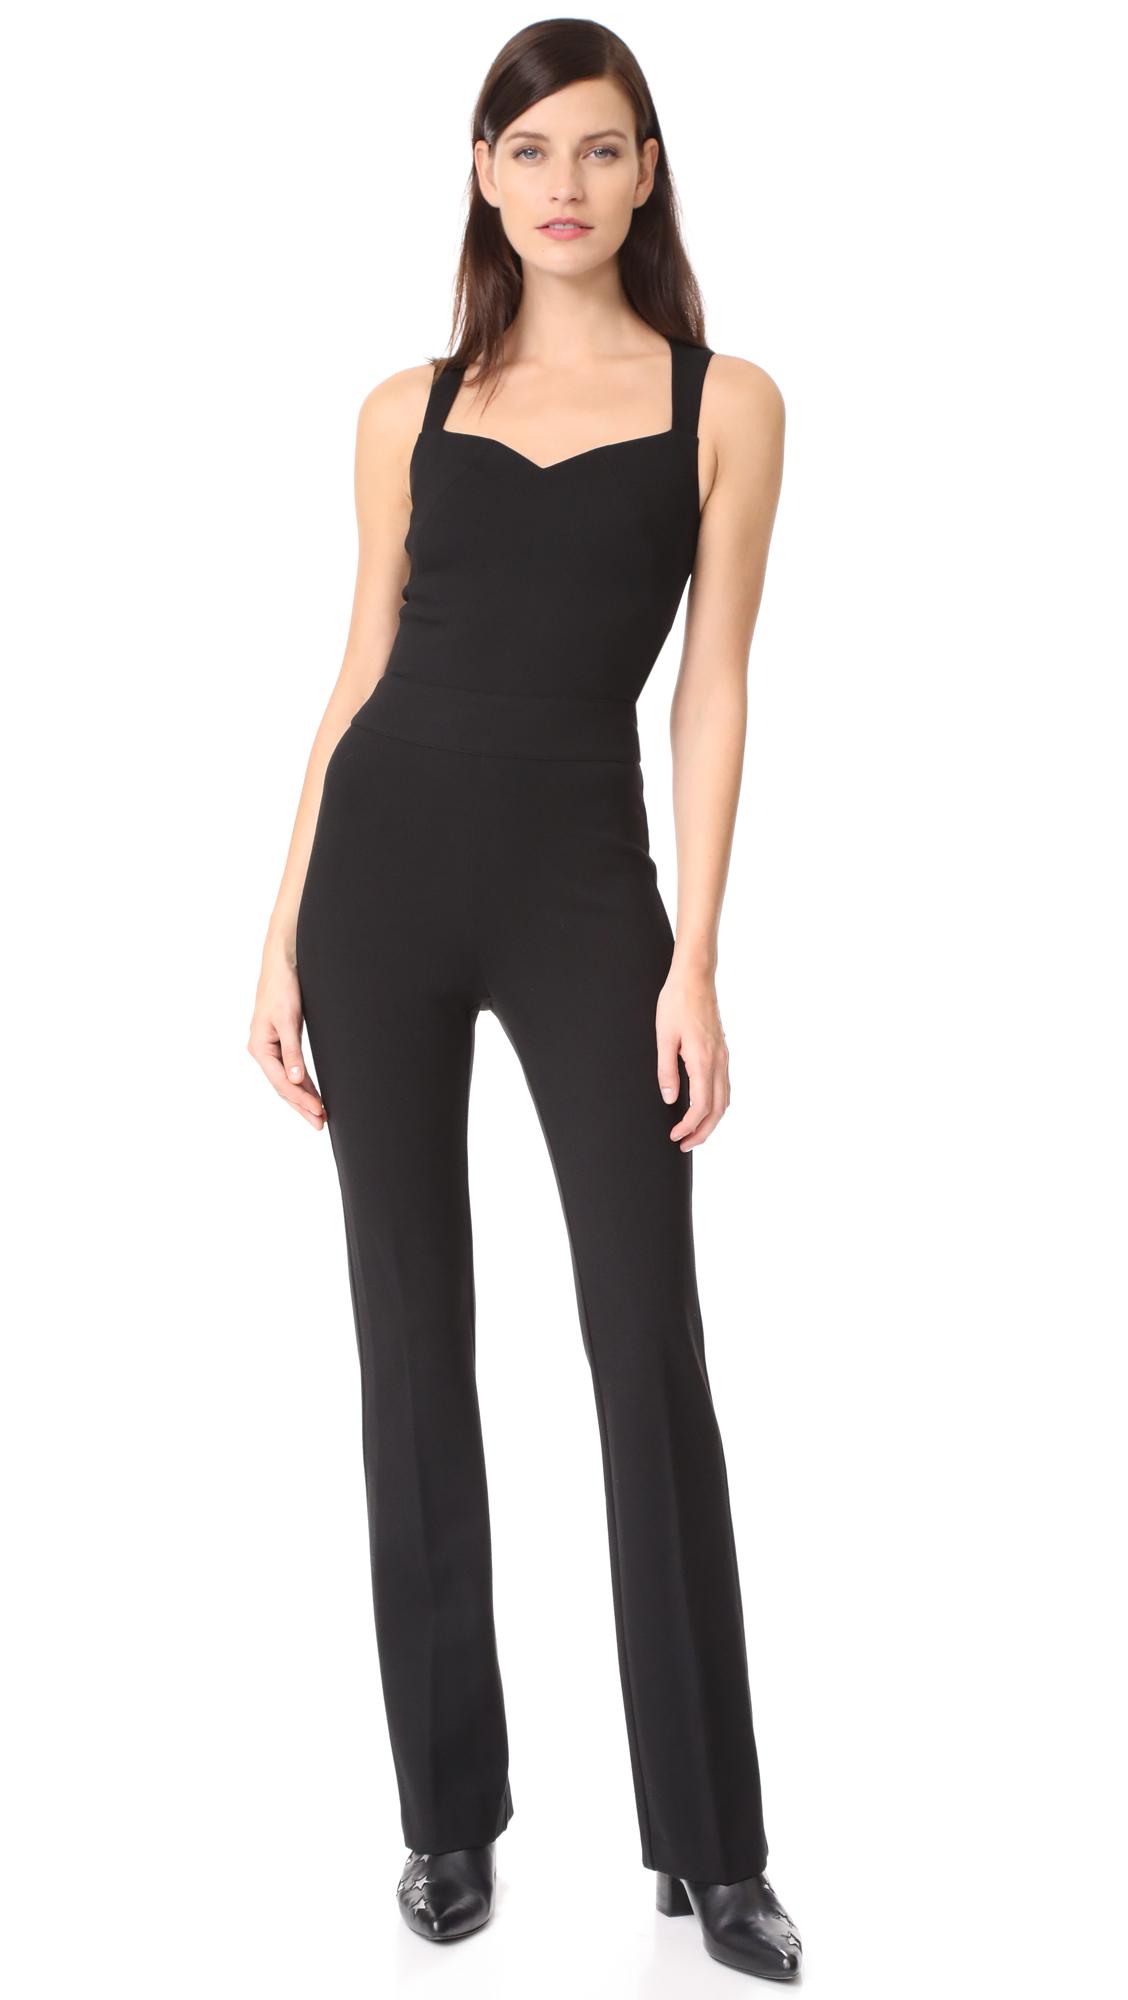 LAGENCE Shay Open Back Jumpsuit - Black